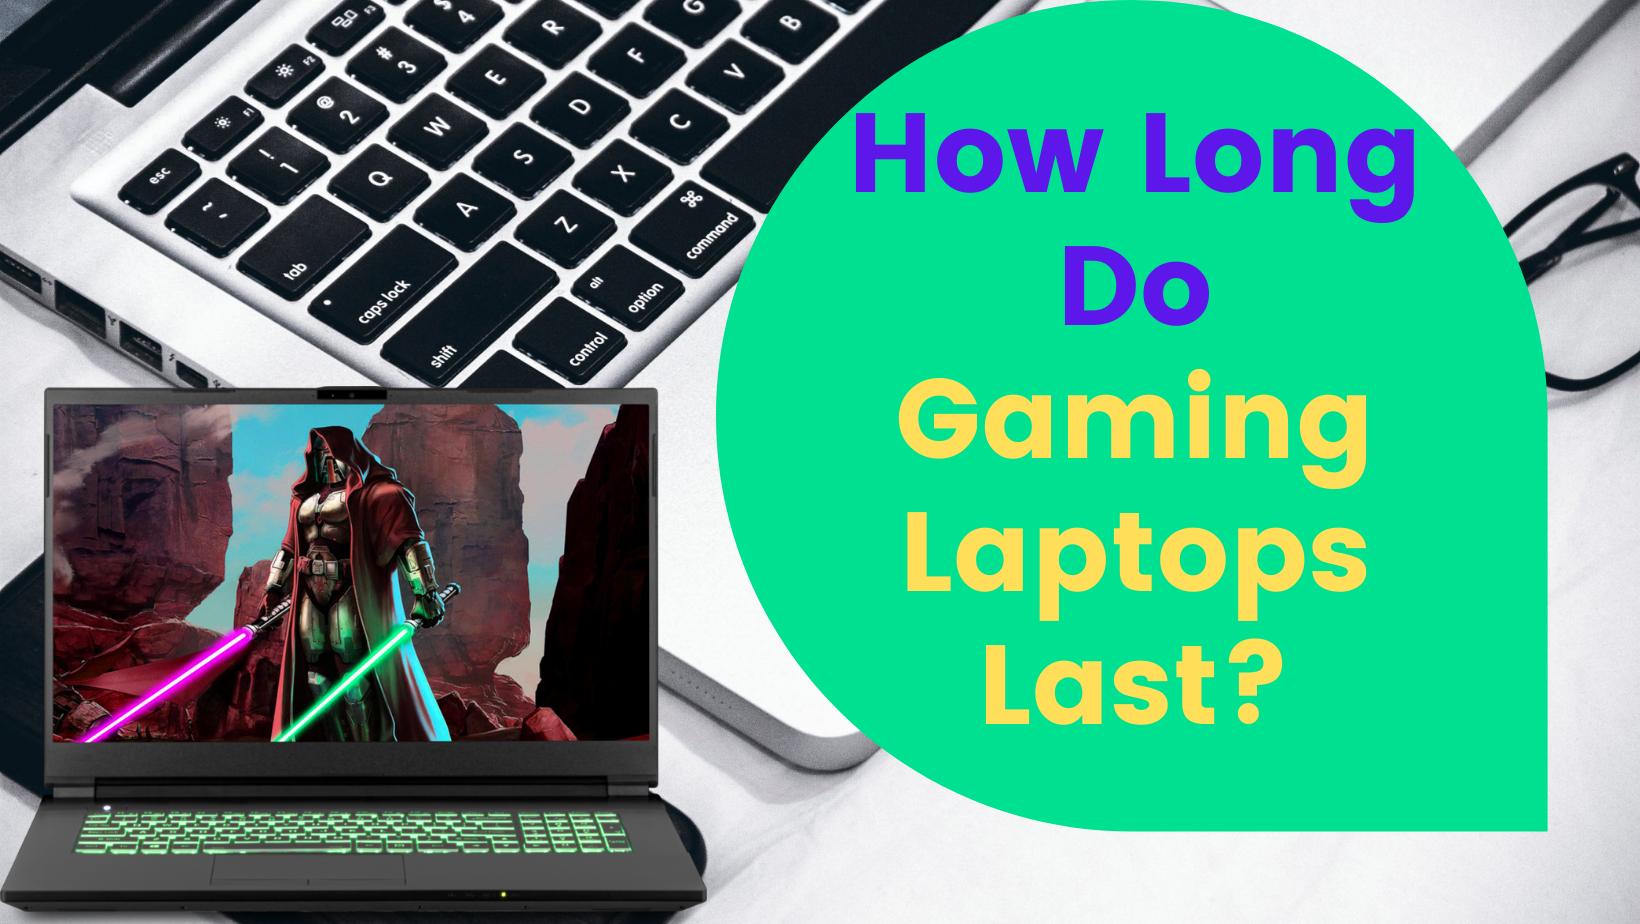 How Long Do Gaming Laptops Last